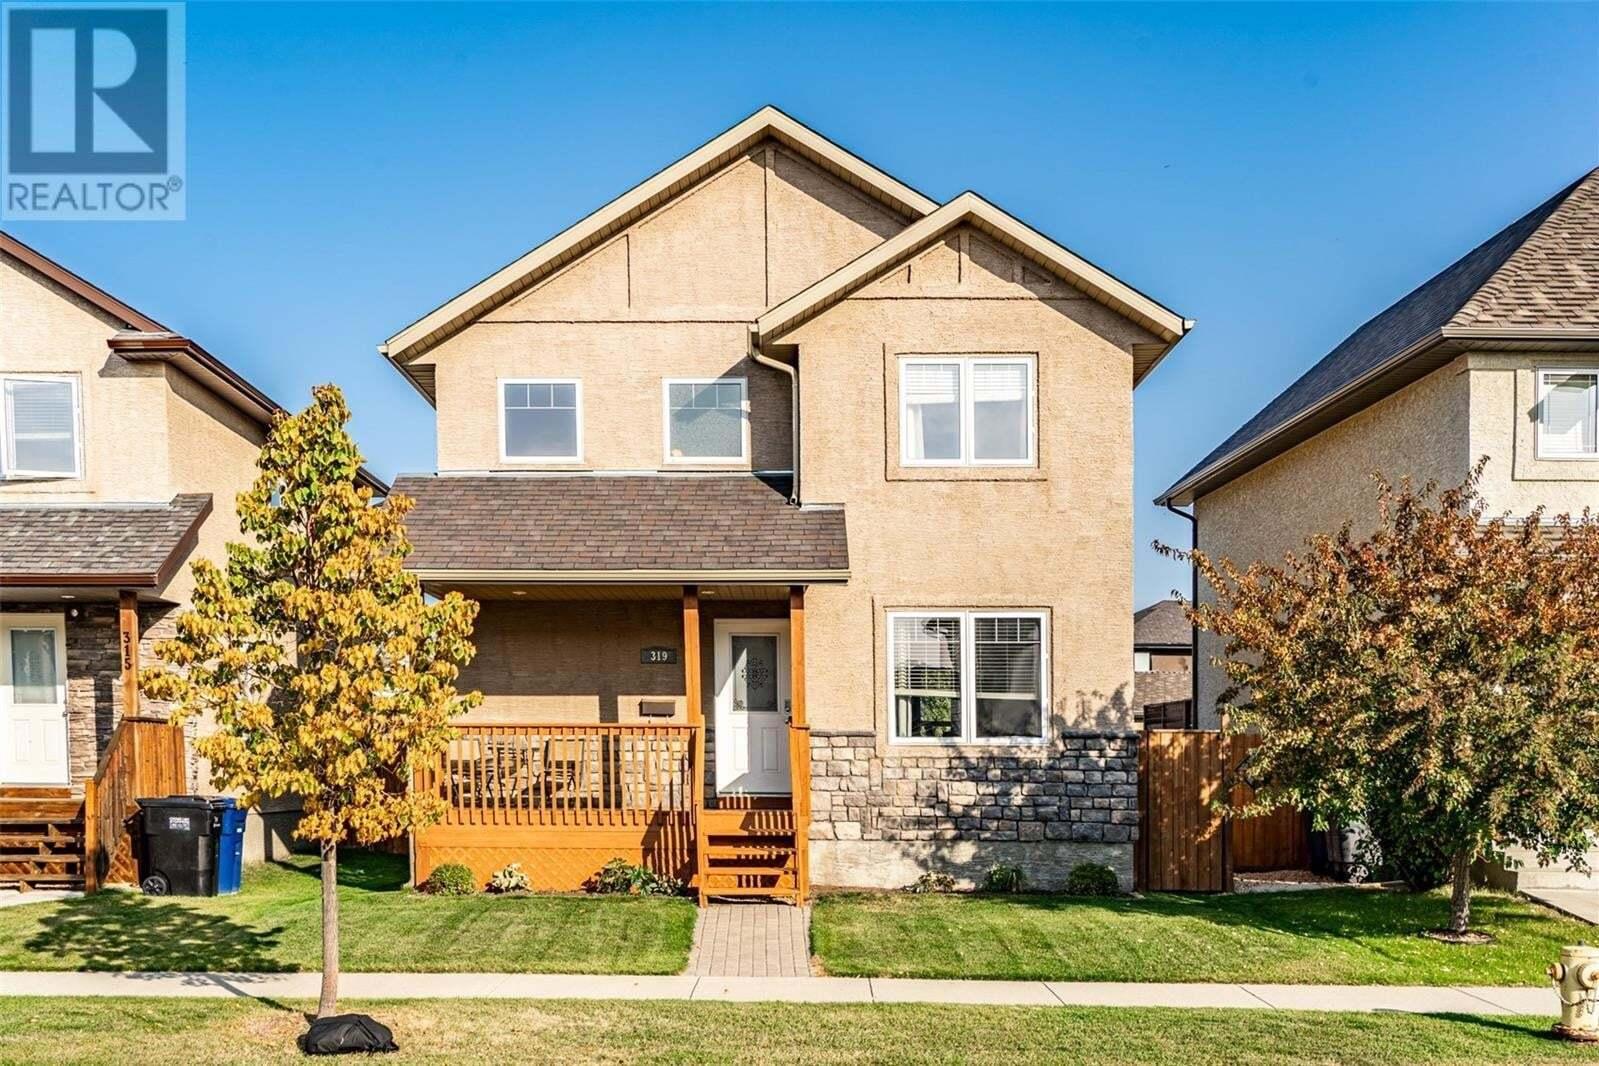 House for sale at 319 Galloway Rd Saskatoon Saskatchewan - MLS: SK827851